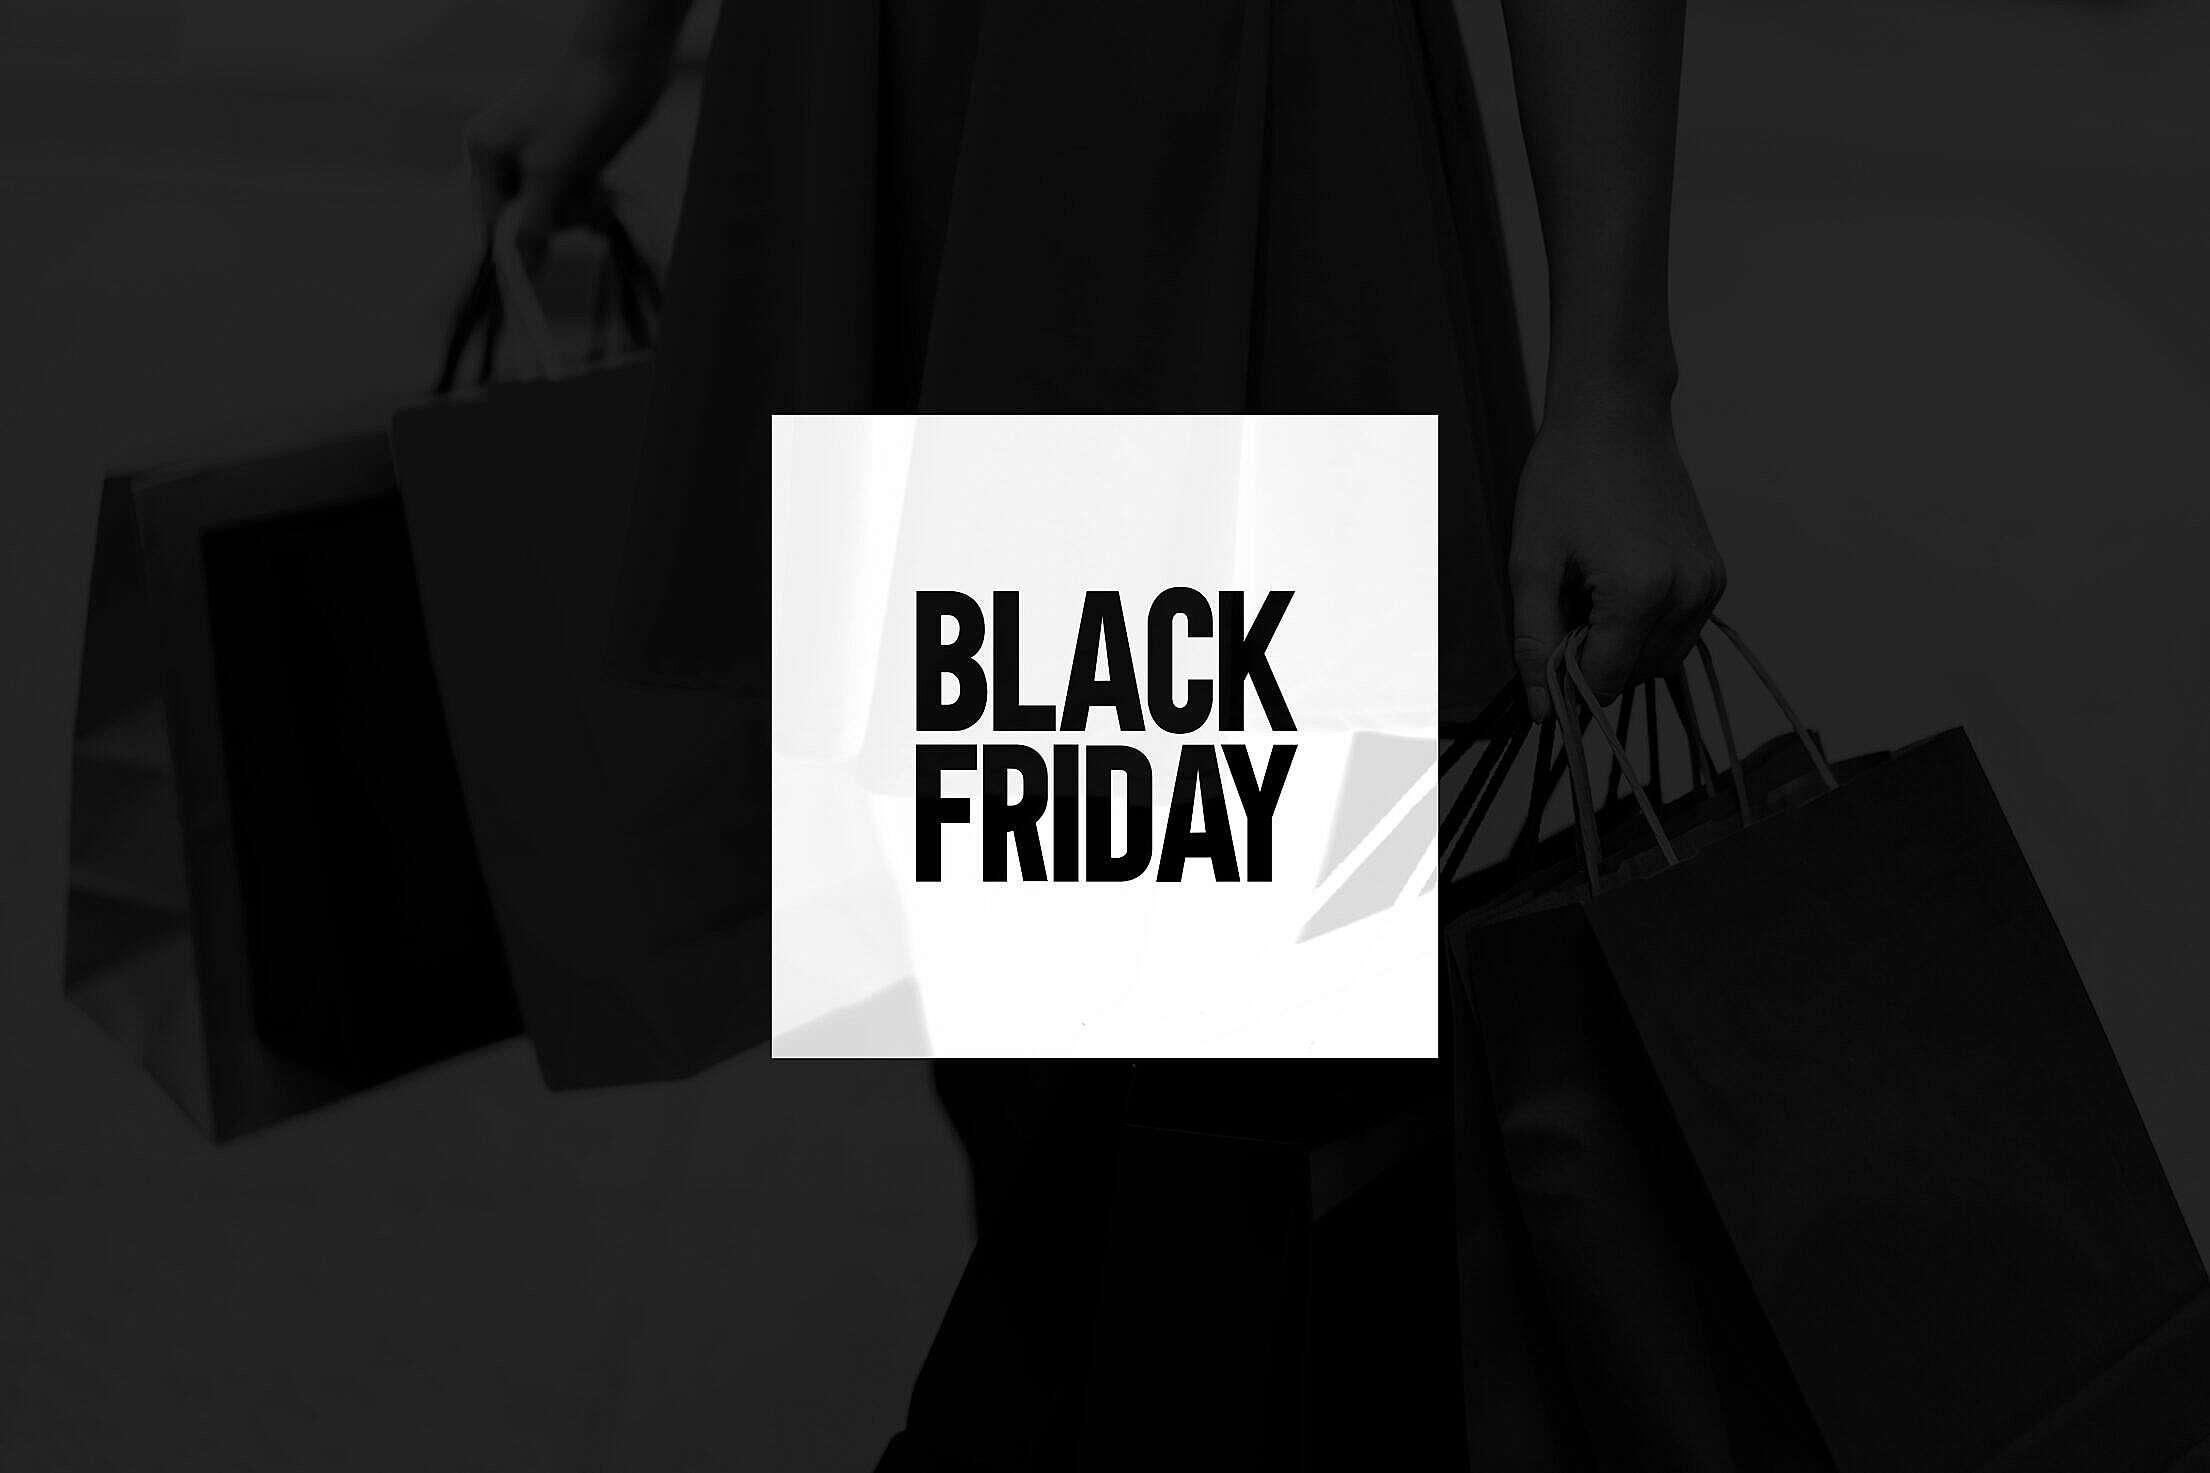 Black Friday Poster Free Stock Photo